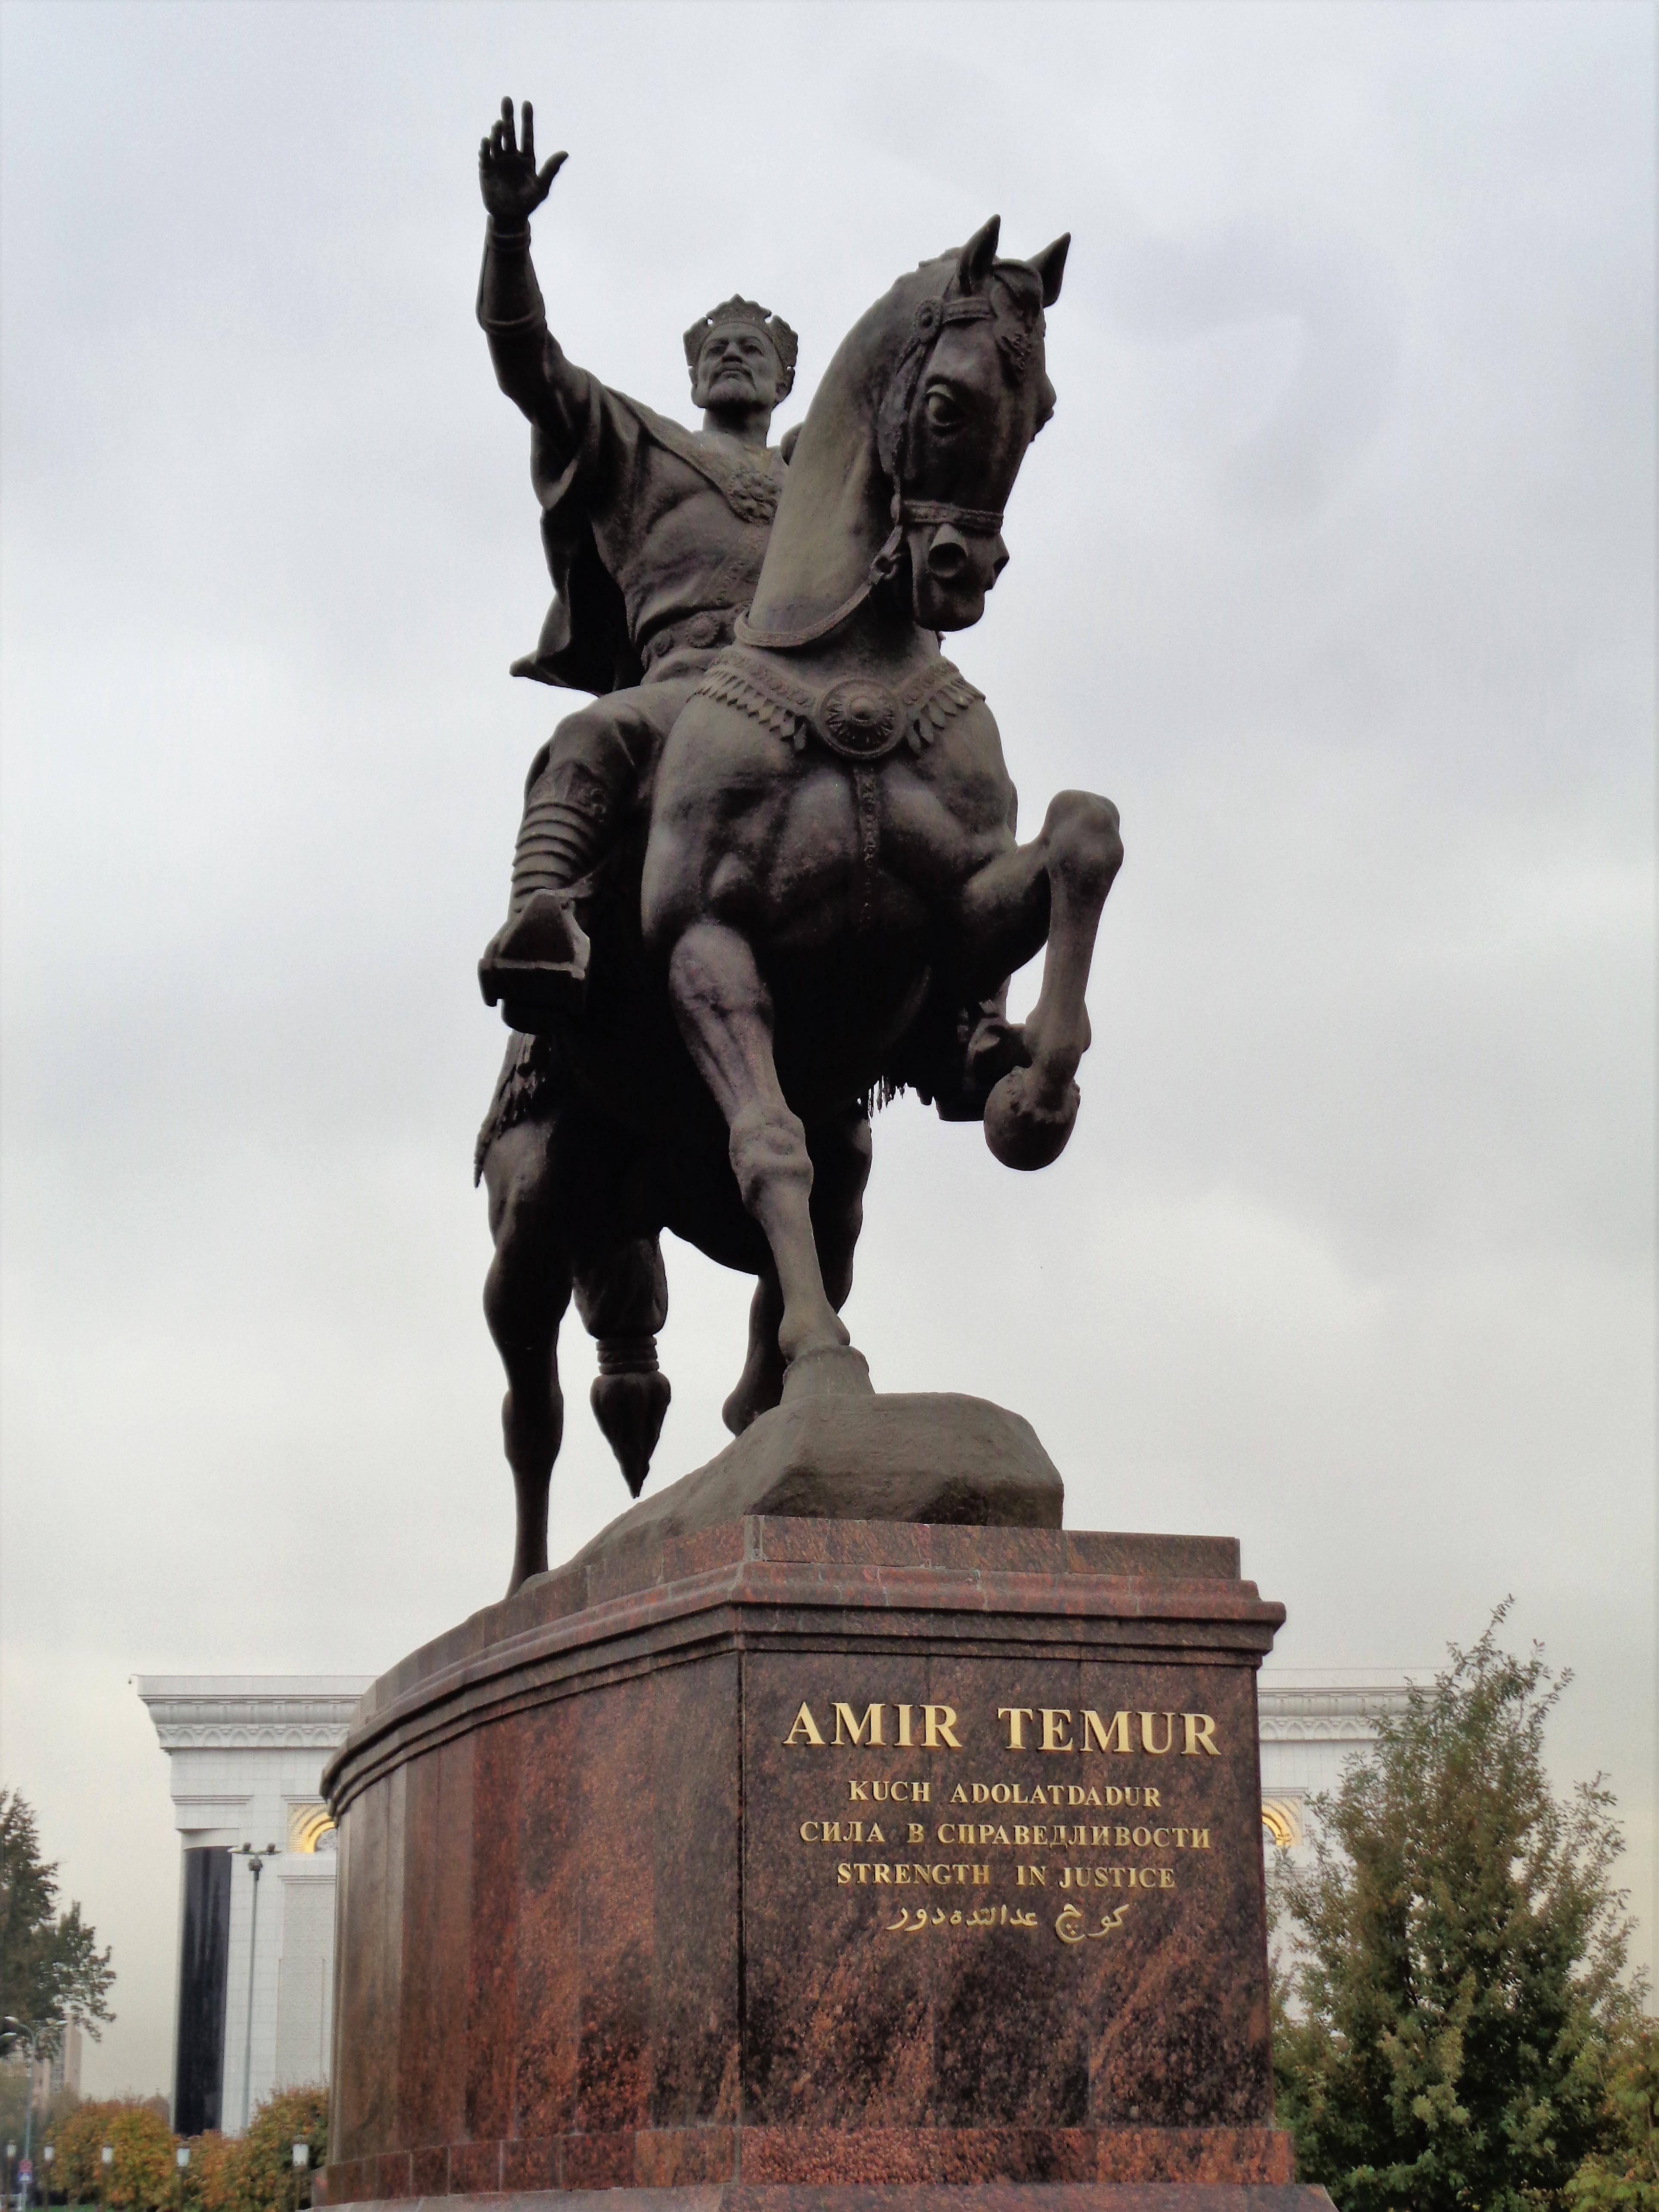 Amir_Temur